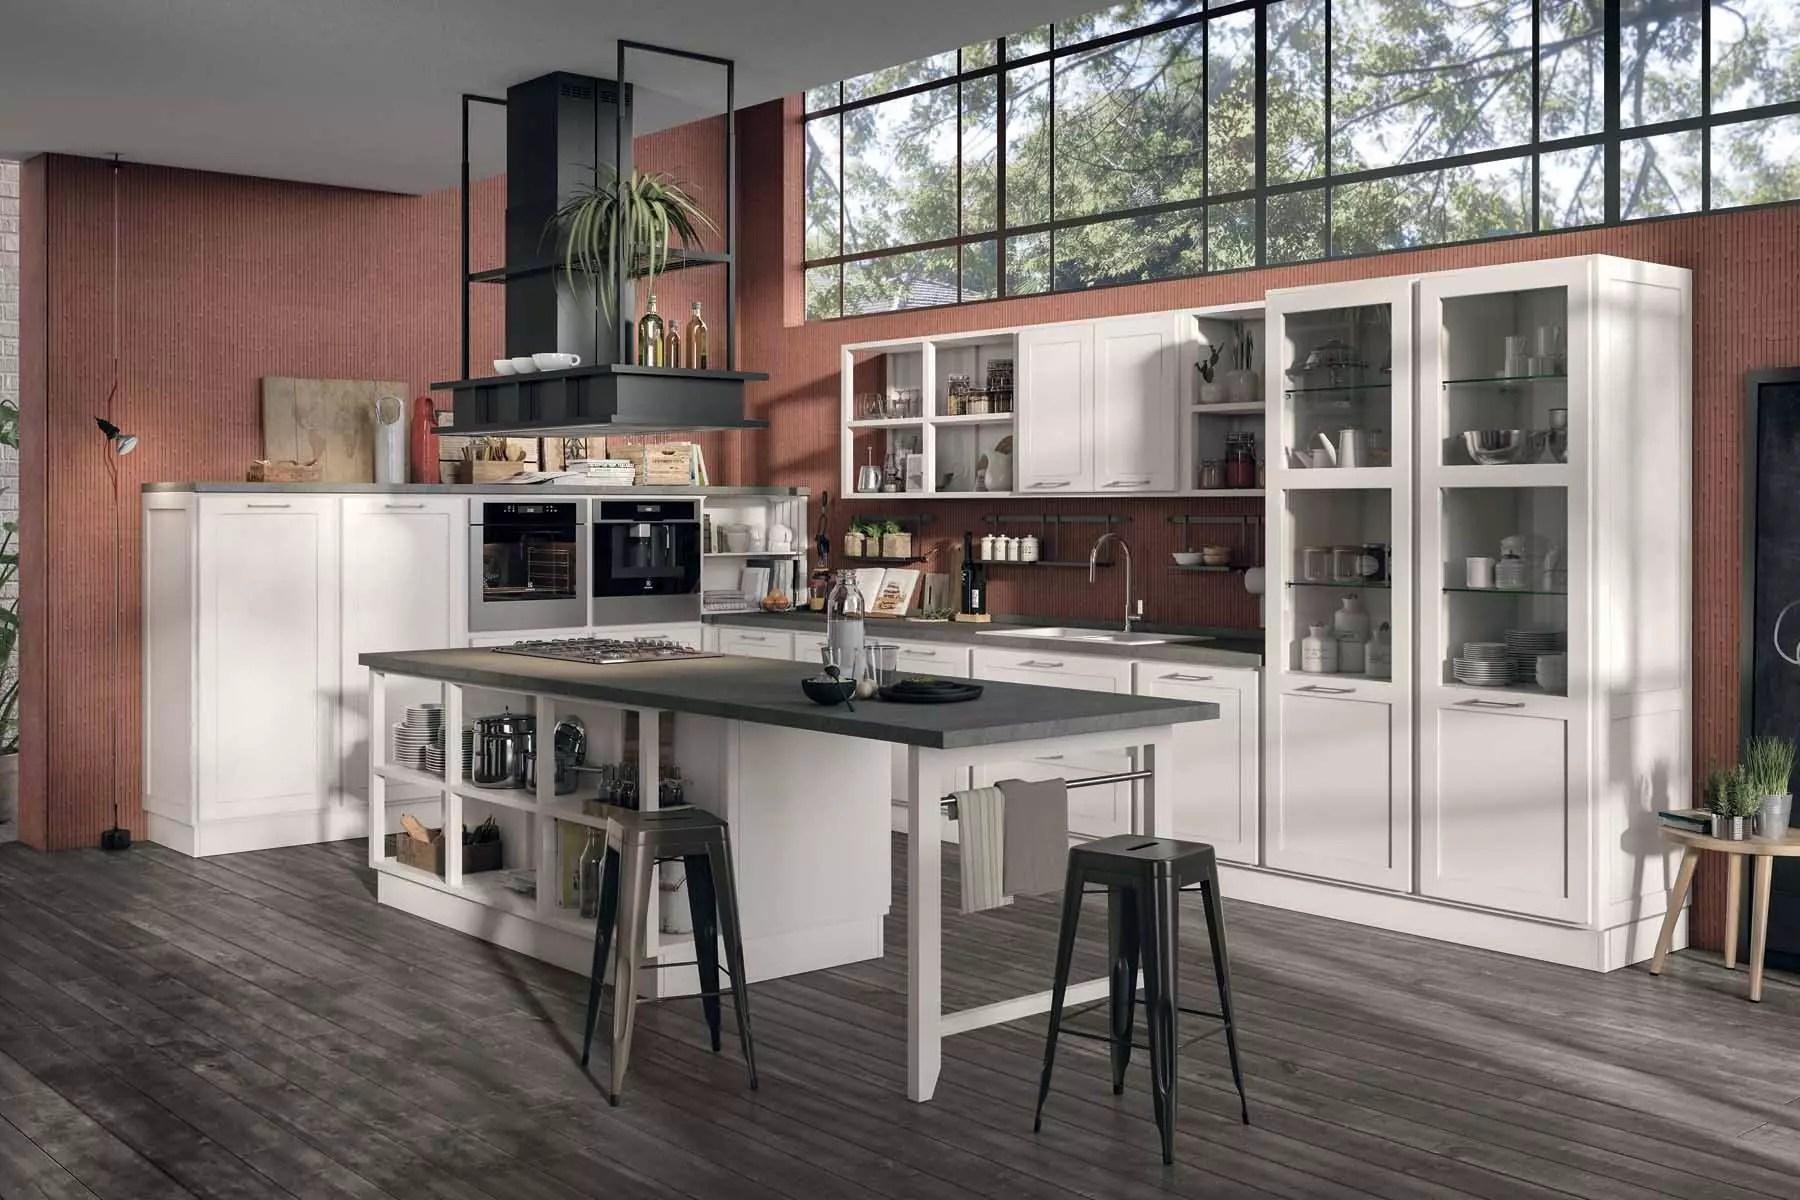 Cucine Lube Qualità | Cucine Lube Prezzi Offerte Cucine Ponibili ...